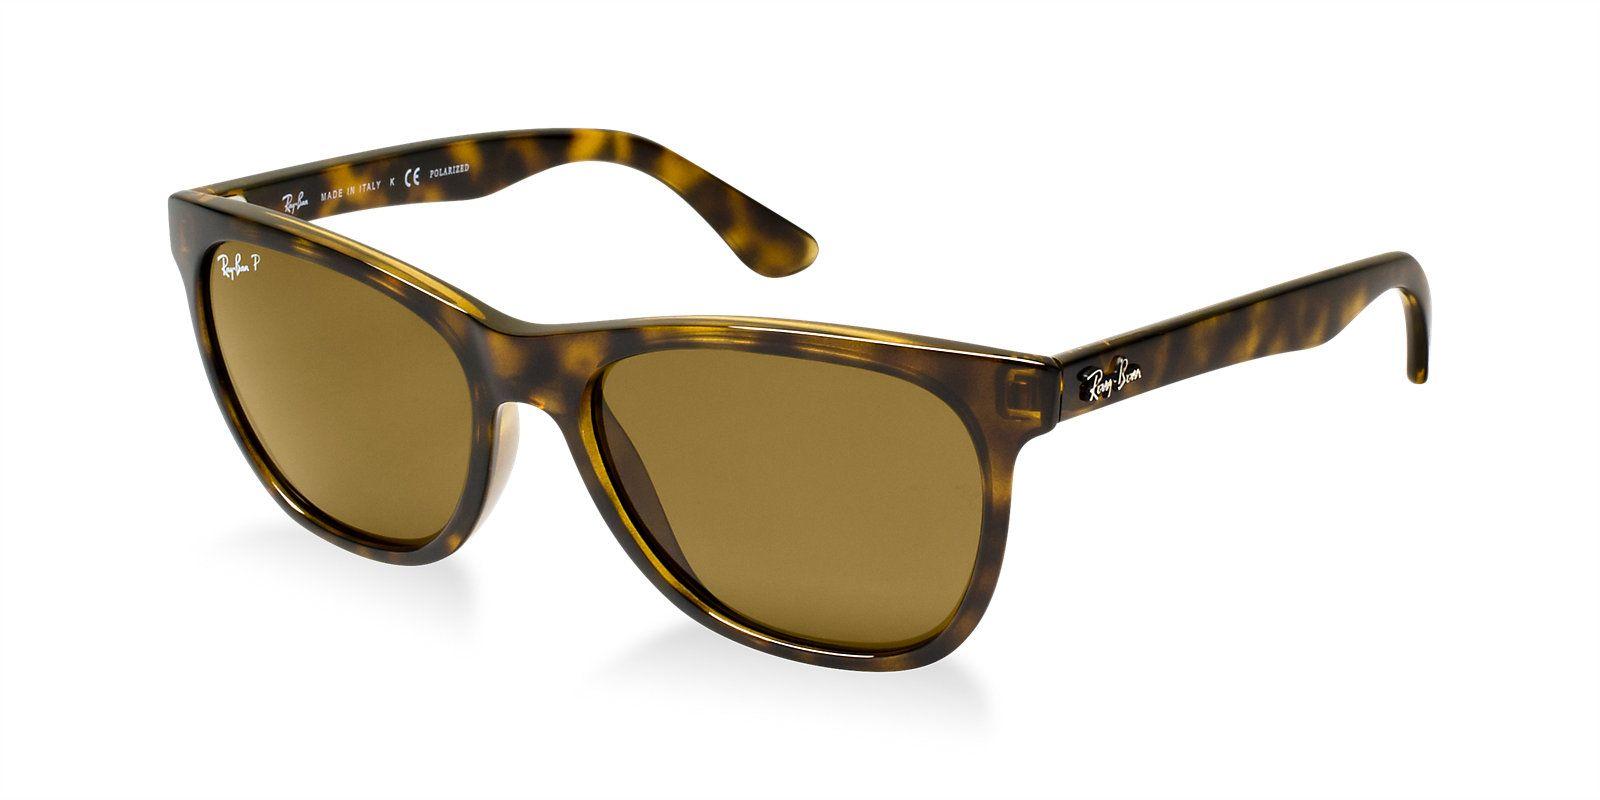 b3e6392c986b Ray-Ban RB4184 Polarized Sunglasses